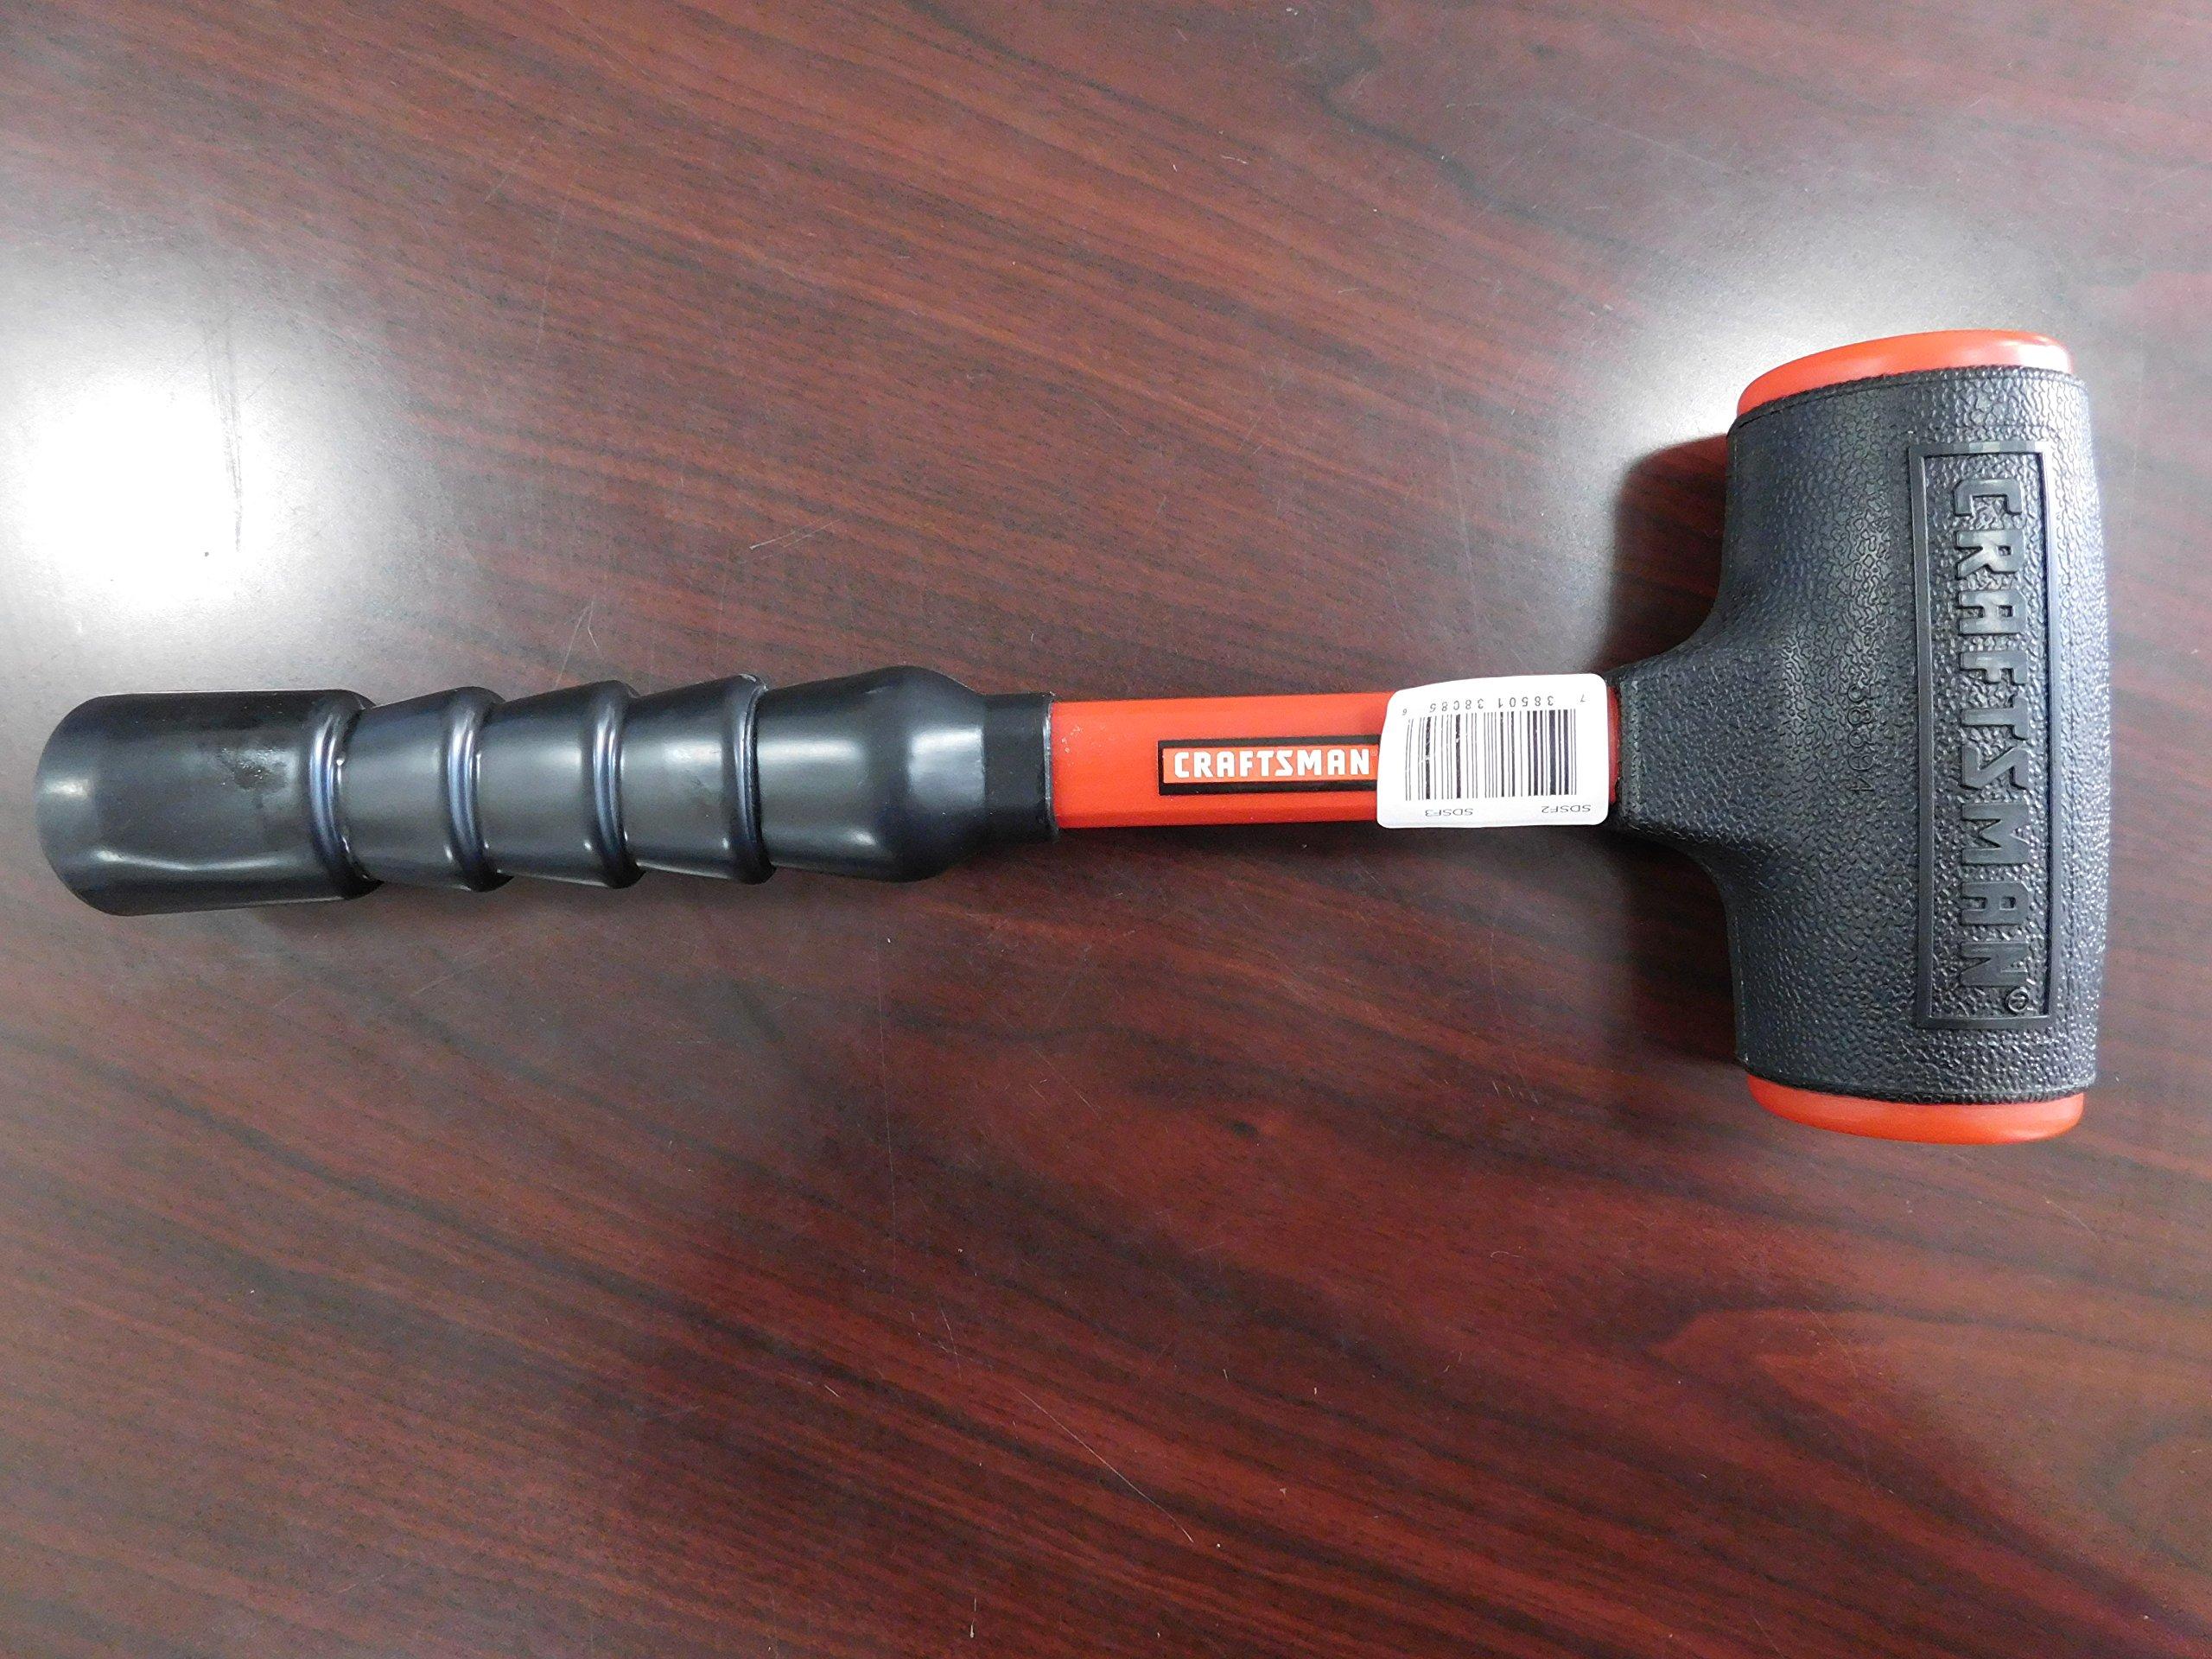 Craftsman 1-Pound Urethane Faced Dead Blow Hammer, Made in USA, Vintage/Rare, Part #938359